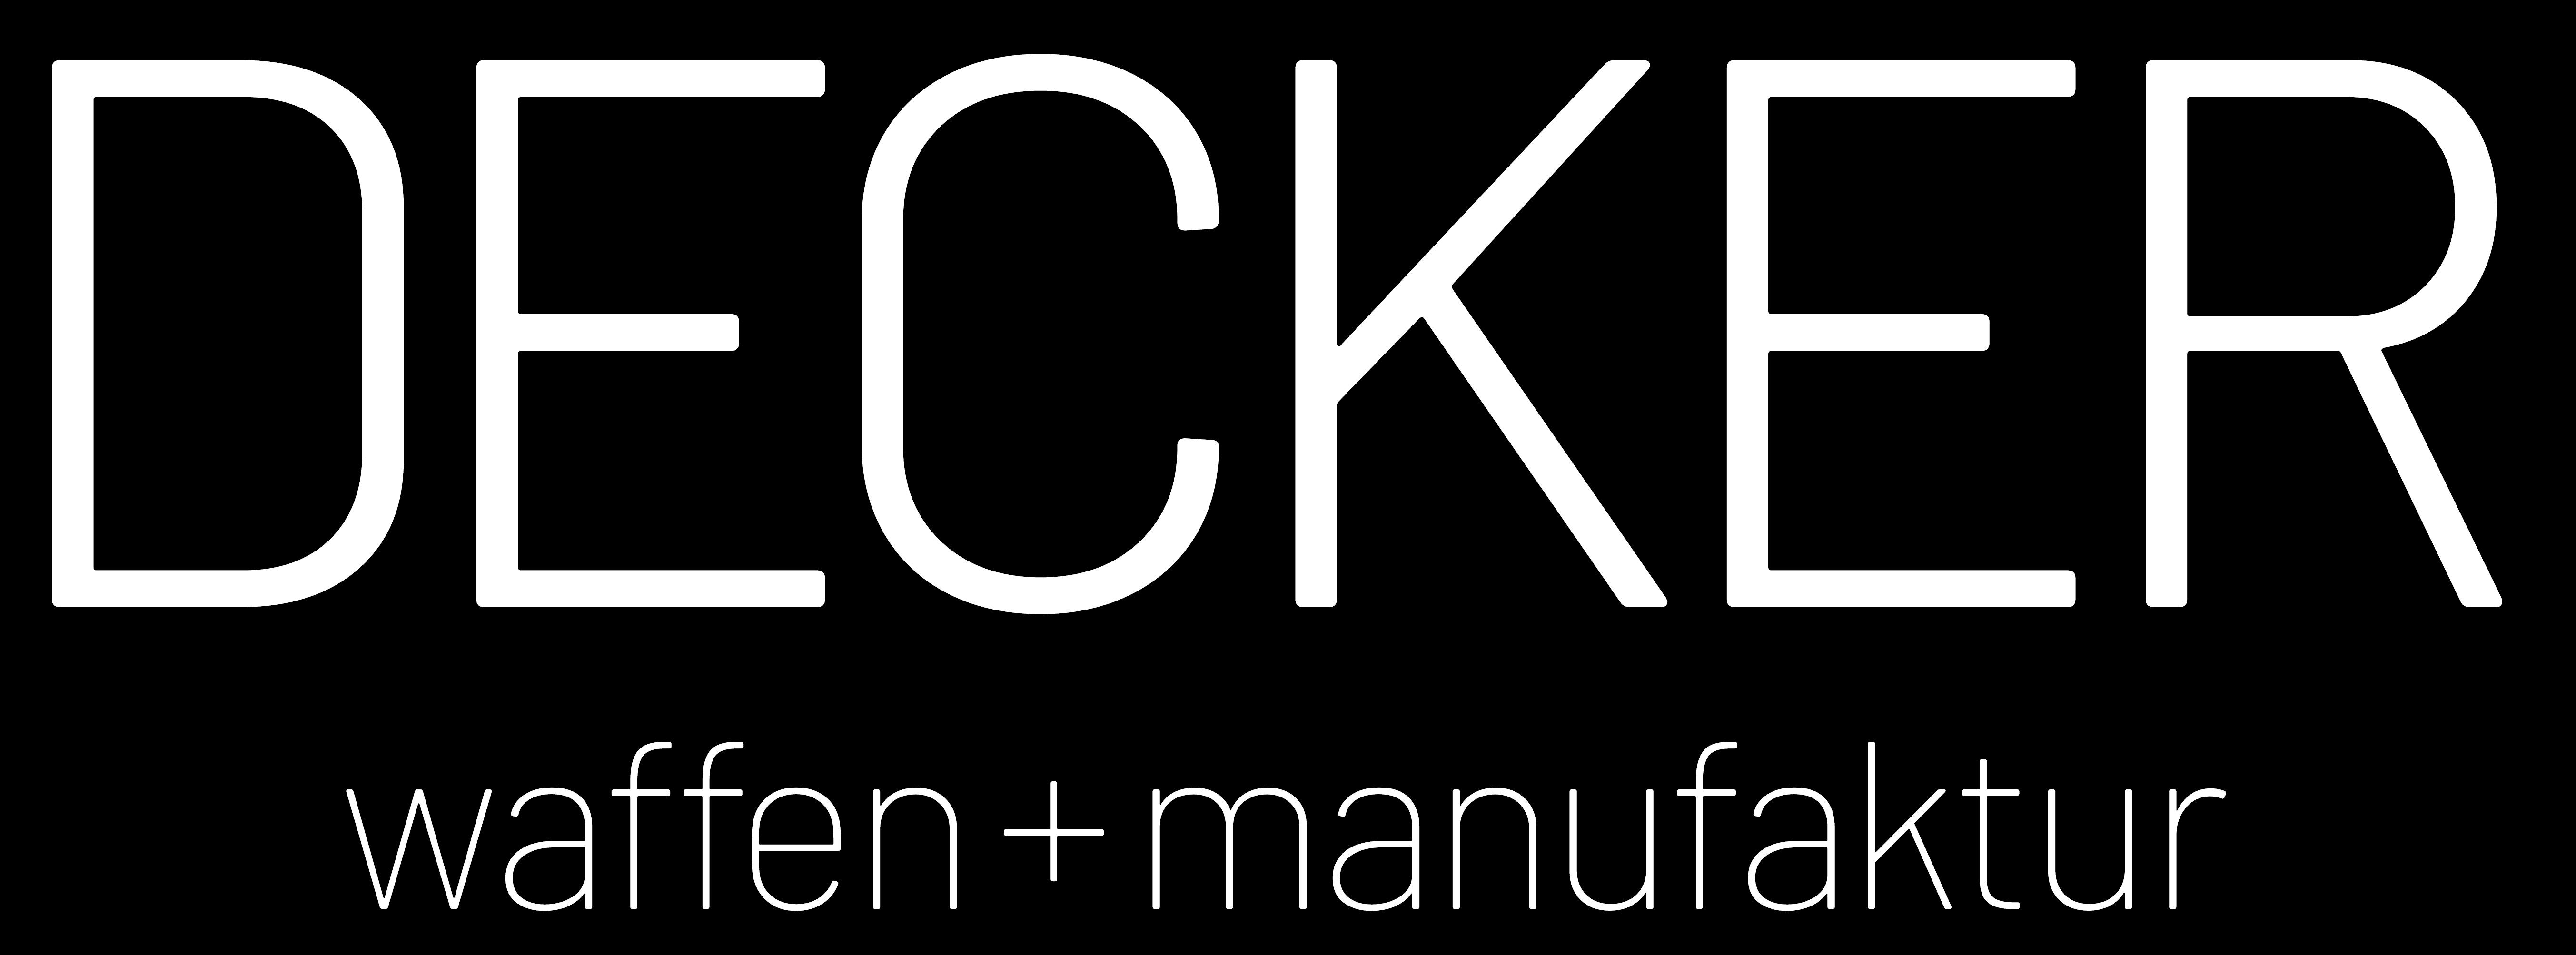 Decker Projekt